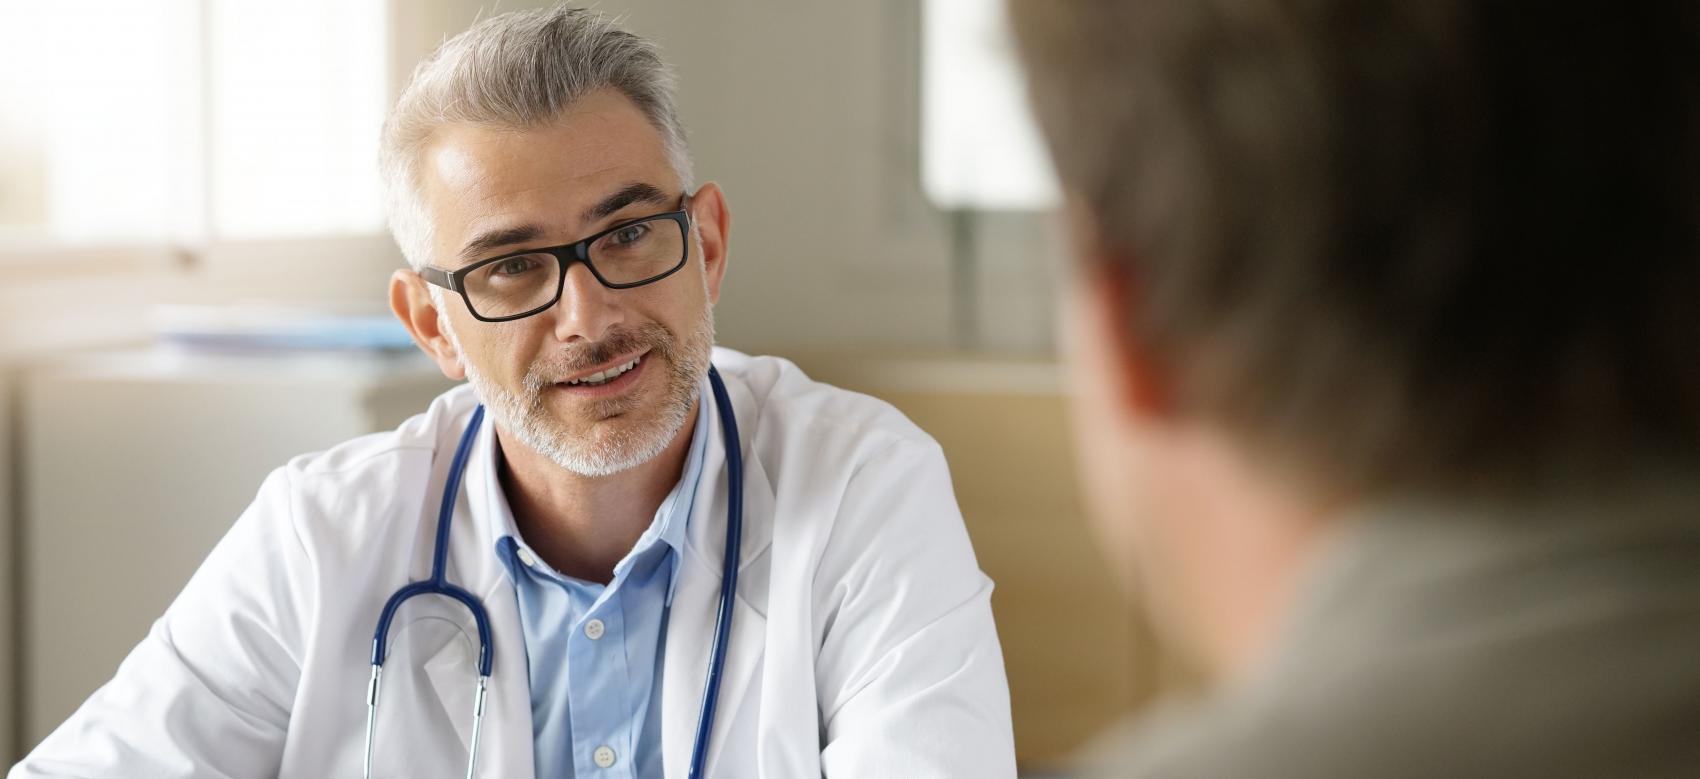 médico entrevistando a paciente